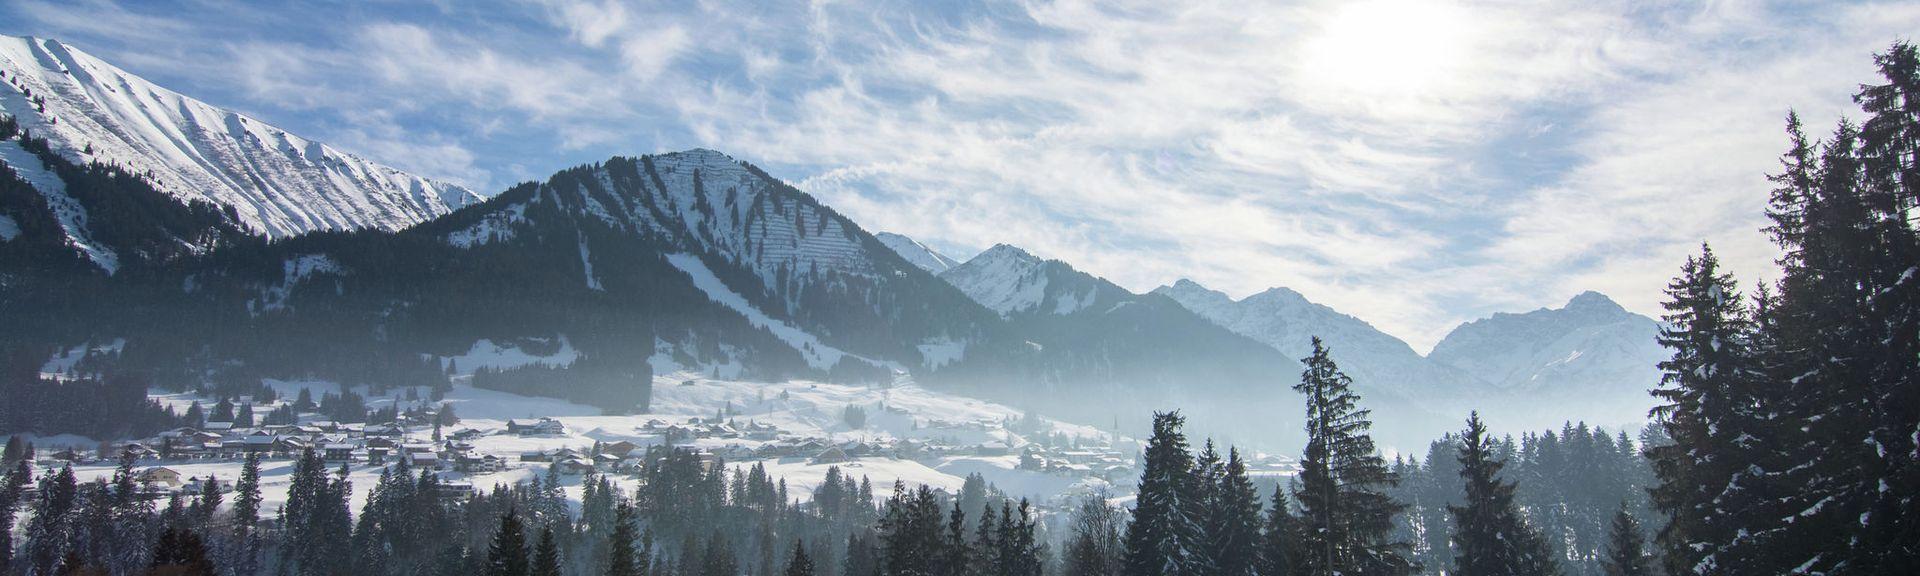 Skilift Schöngraben, Sankt Anton am Arlberg, Tirolo, Austria